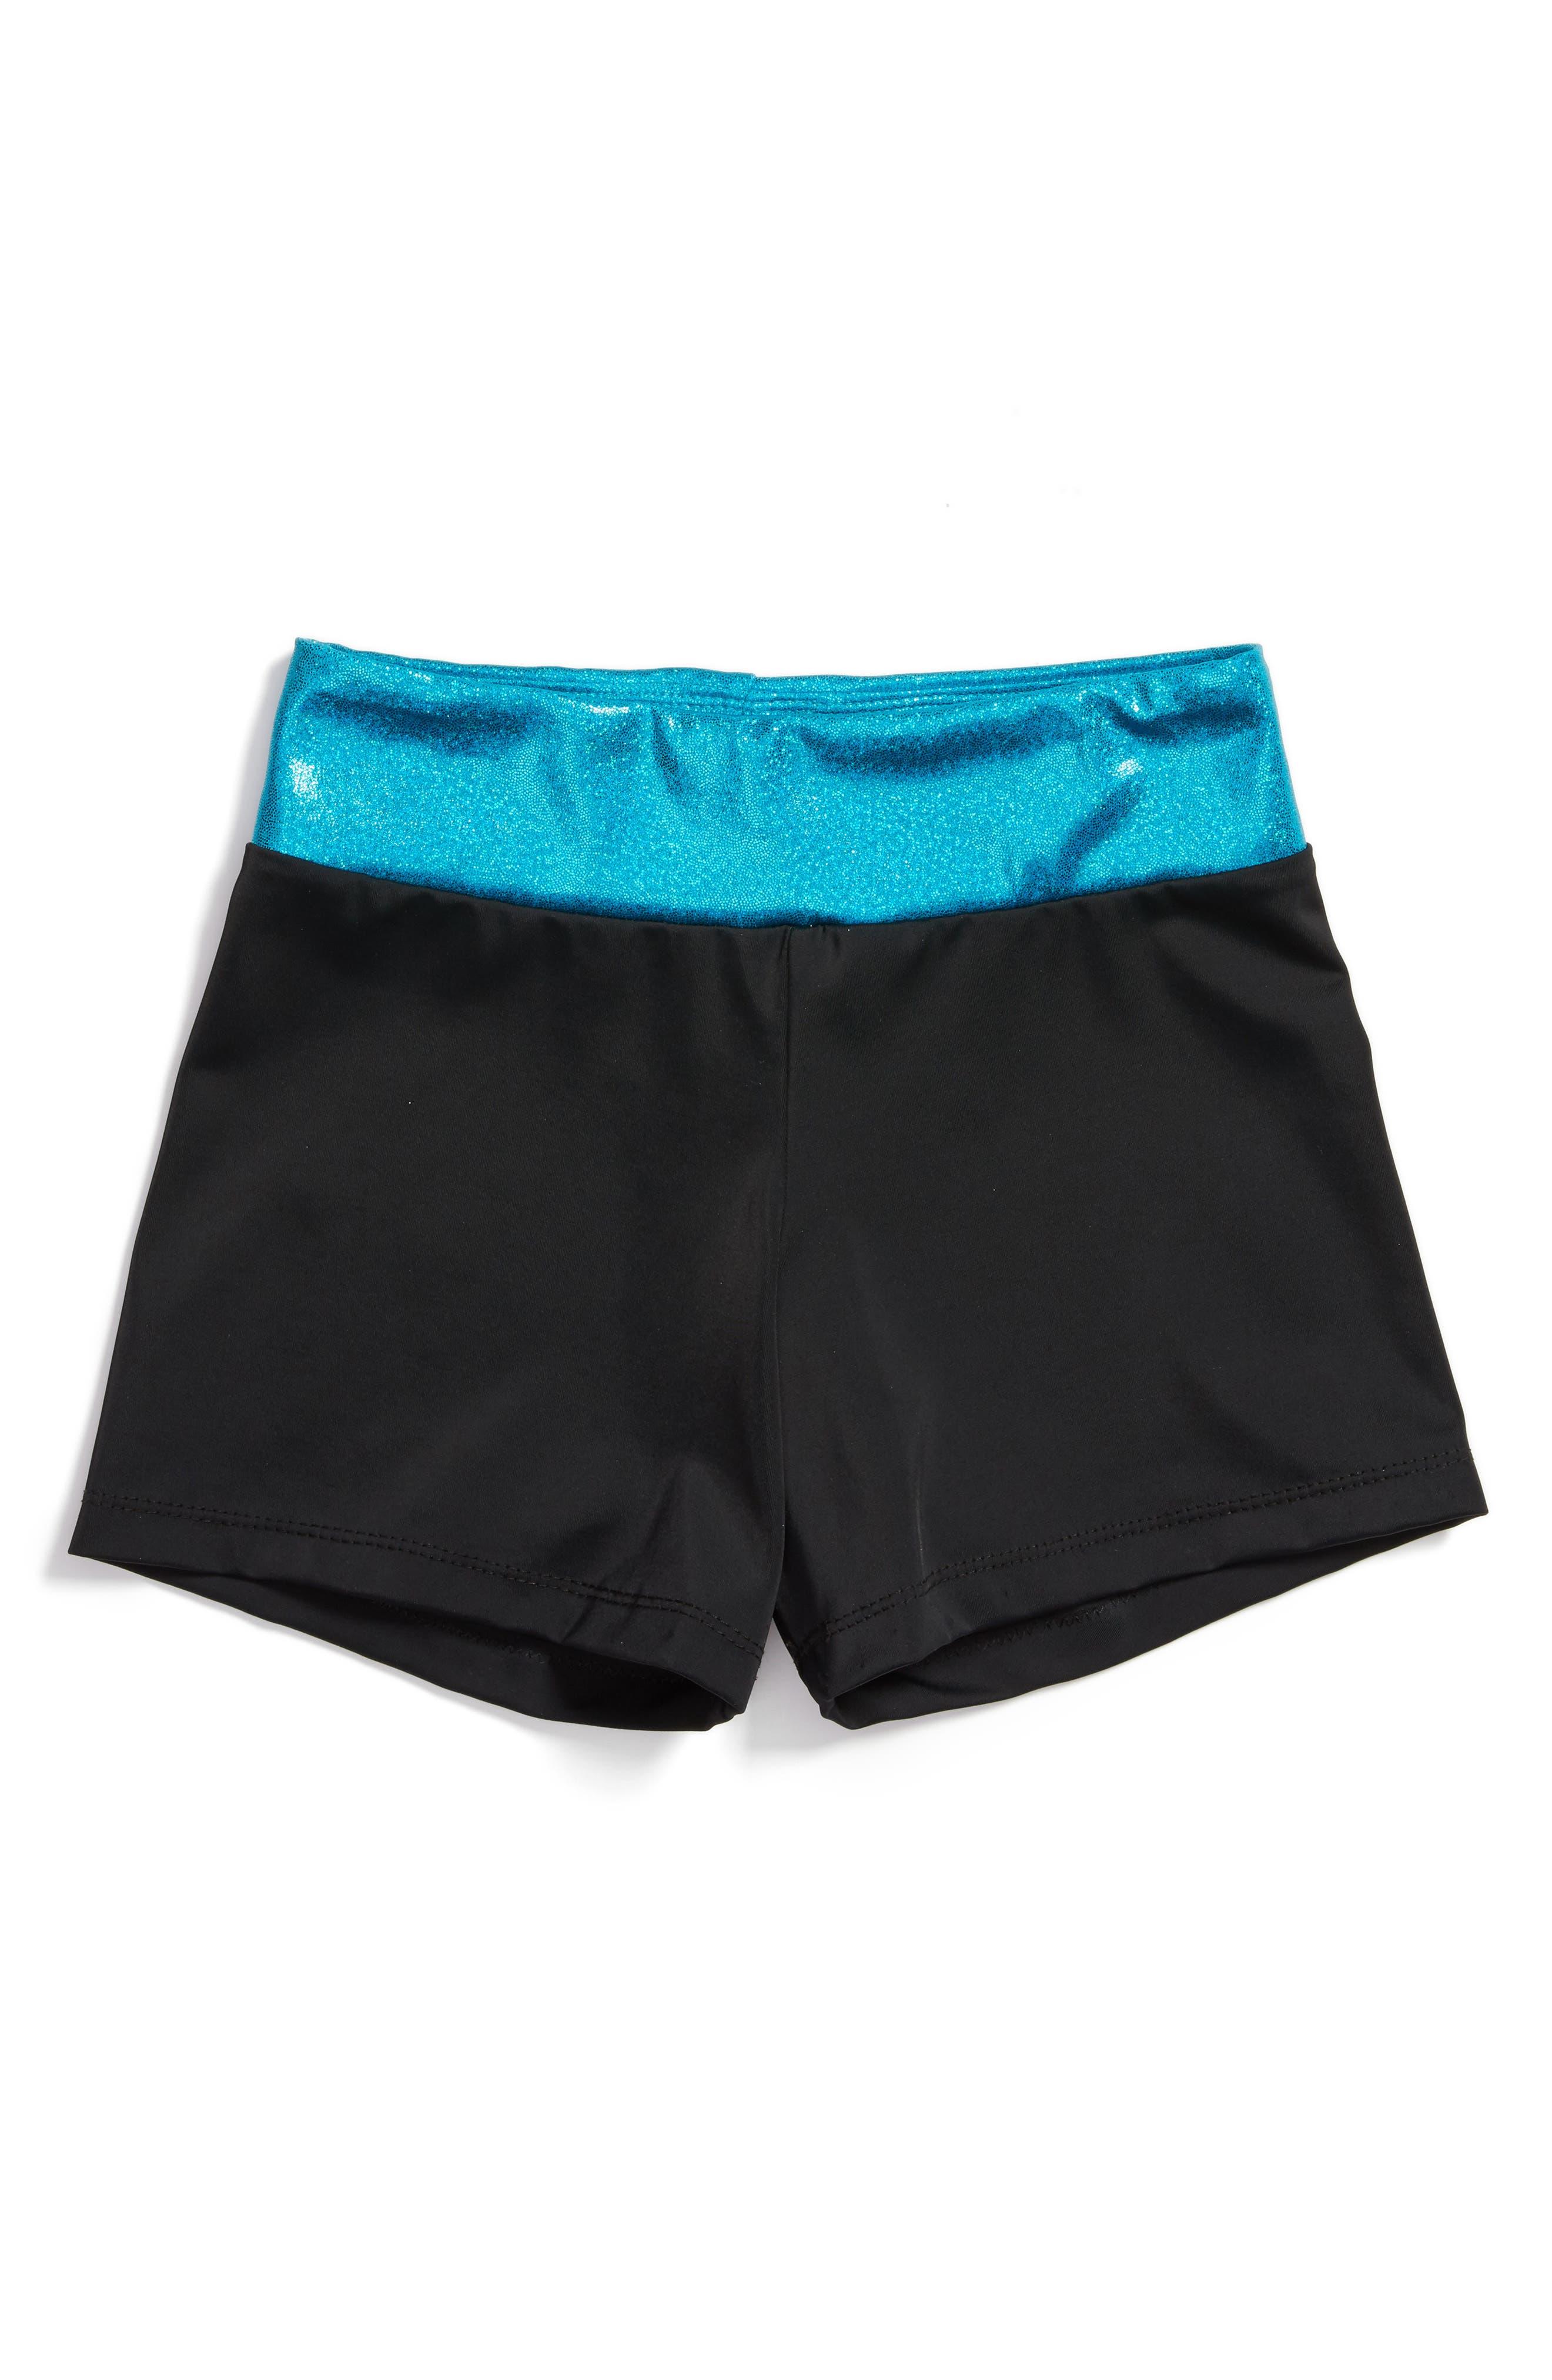 Unicorn Love Stretch Shorts,                             Main thumbnail 1, color,                             001